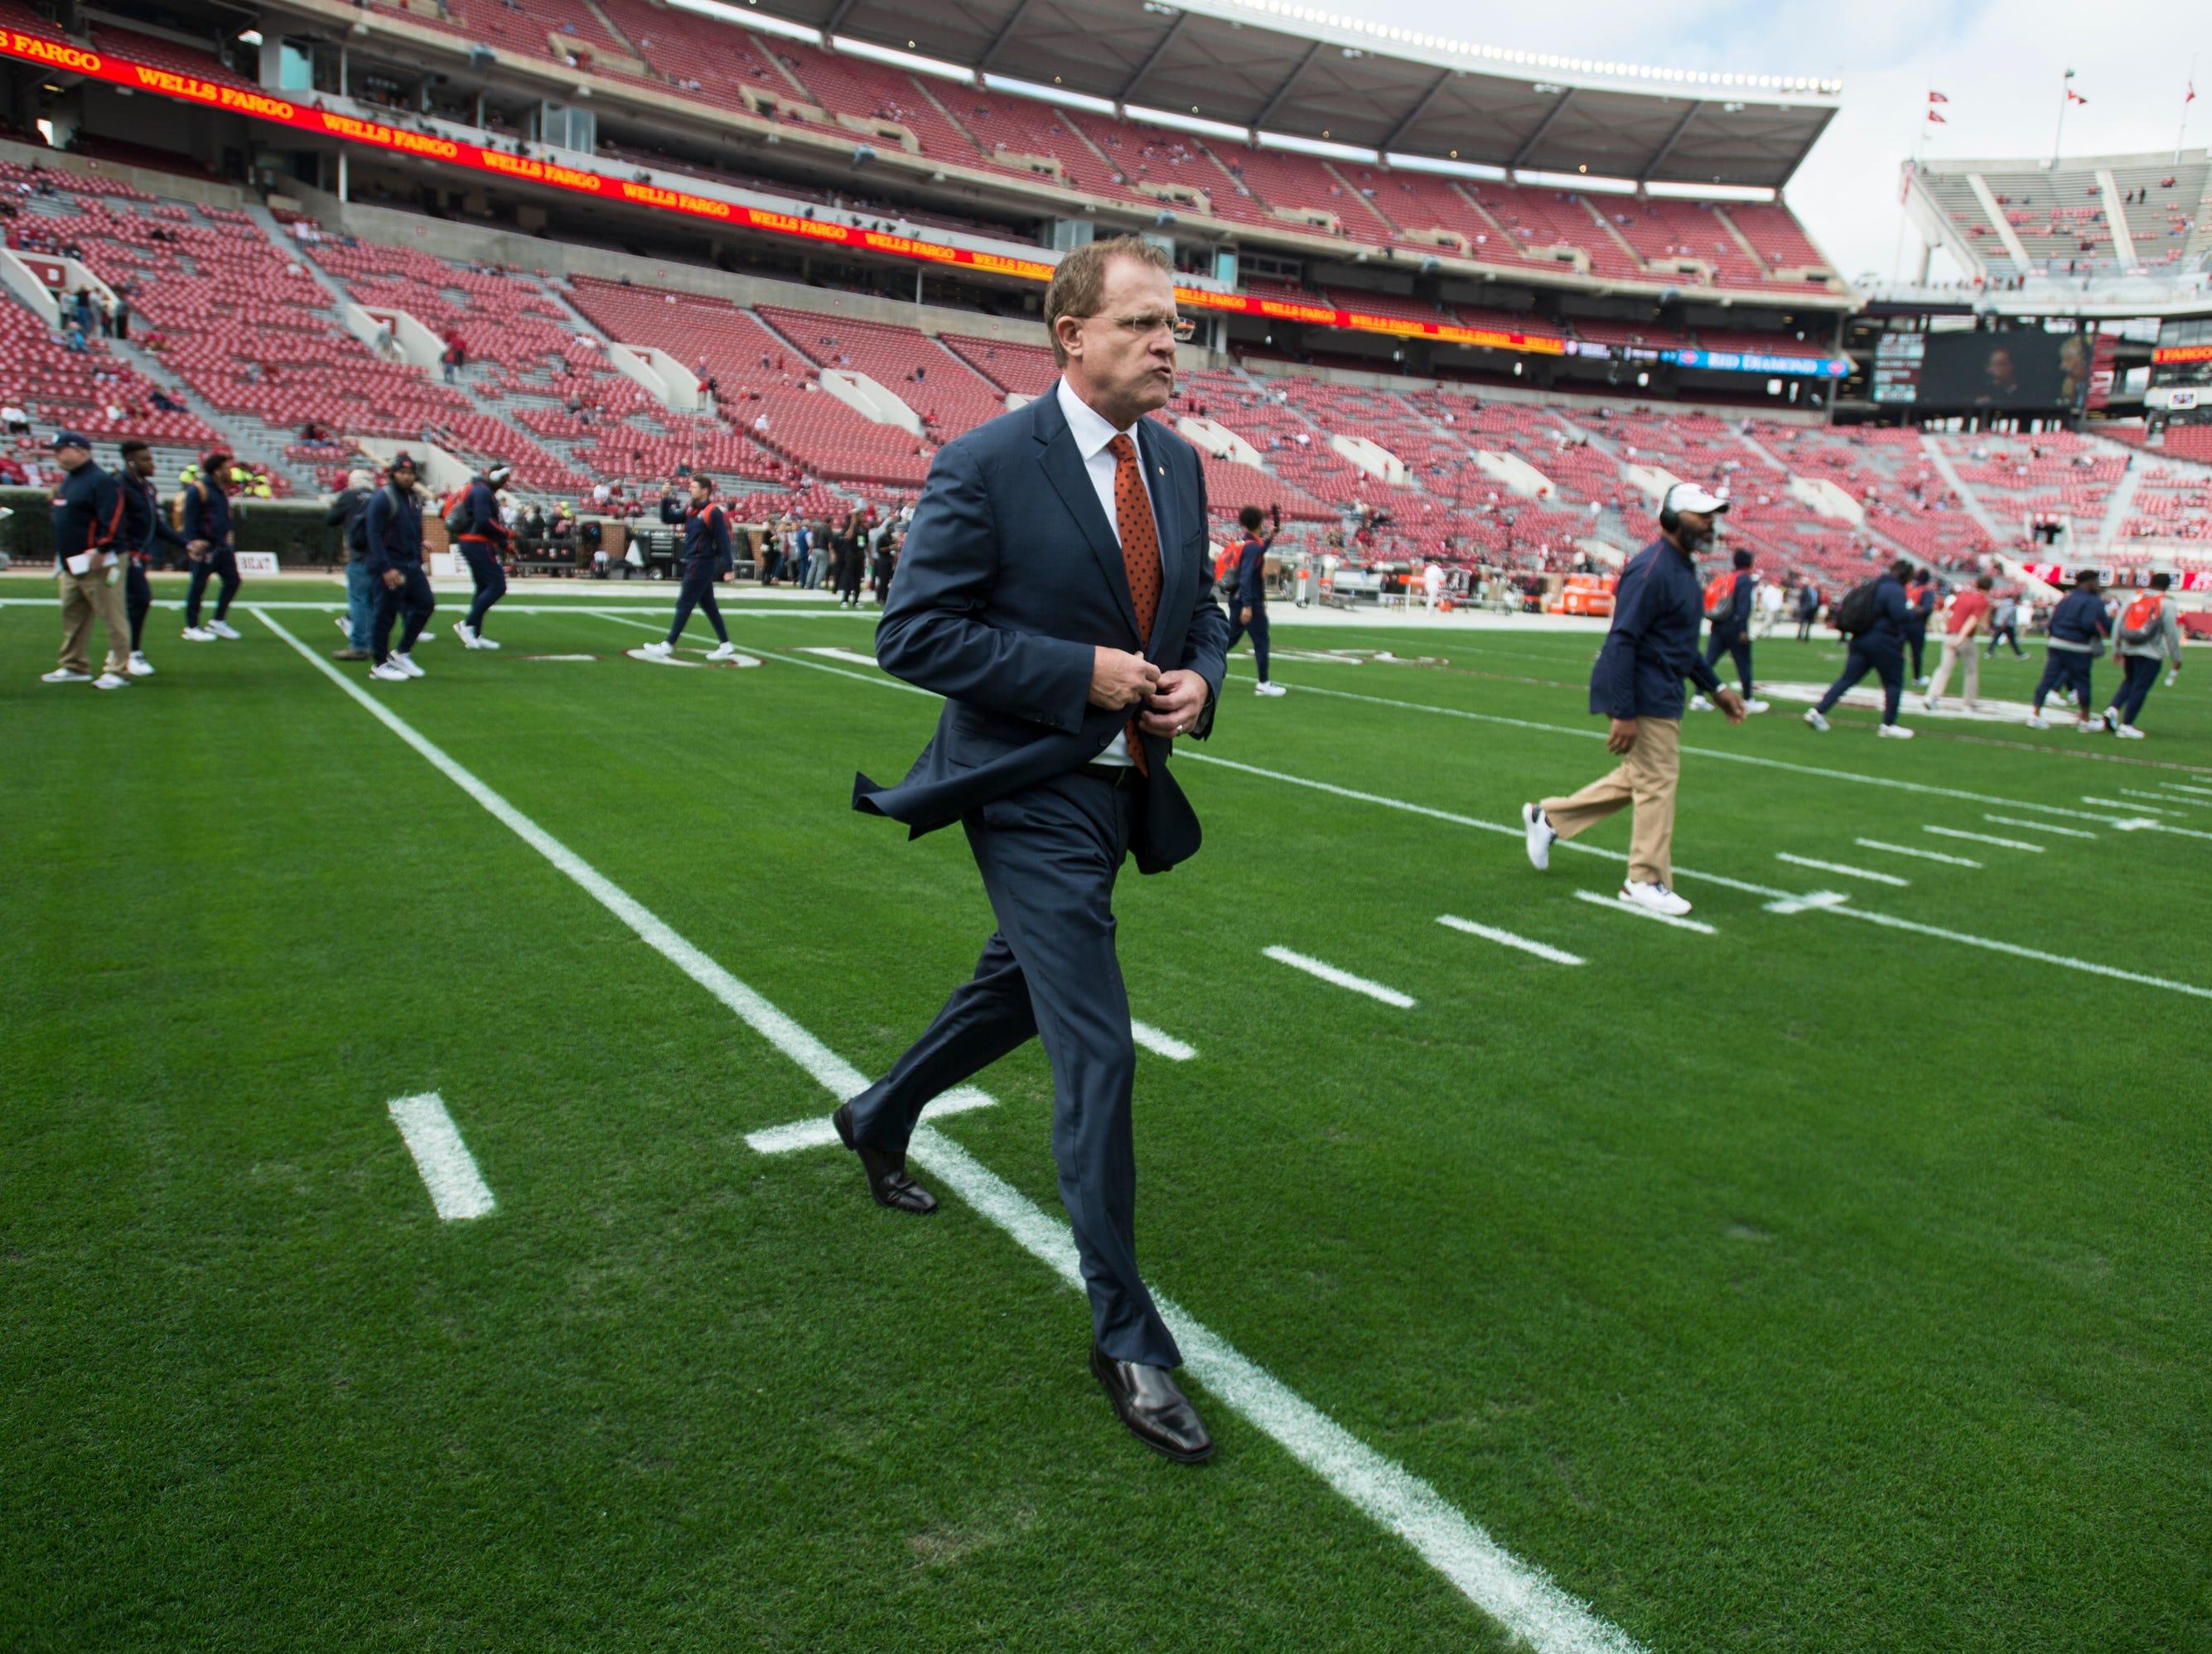 Auburn head coach Gus Malzahn walks the field as his team arrives at Bryant-Denny Stadium in Tuscaloosa, Ala., on Saturday, Nov. 24, 2018.